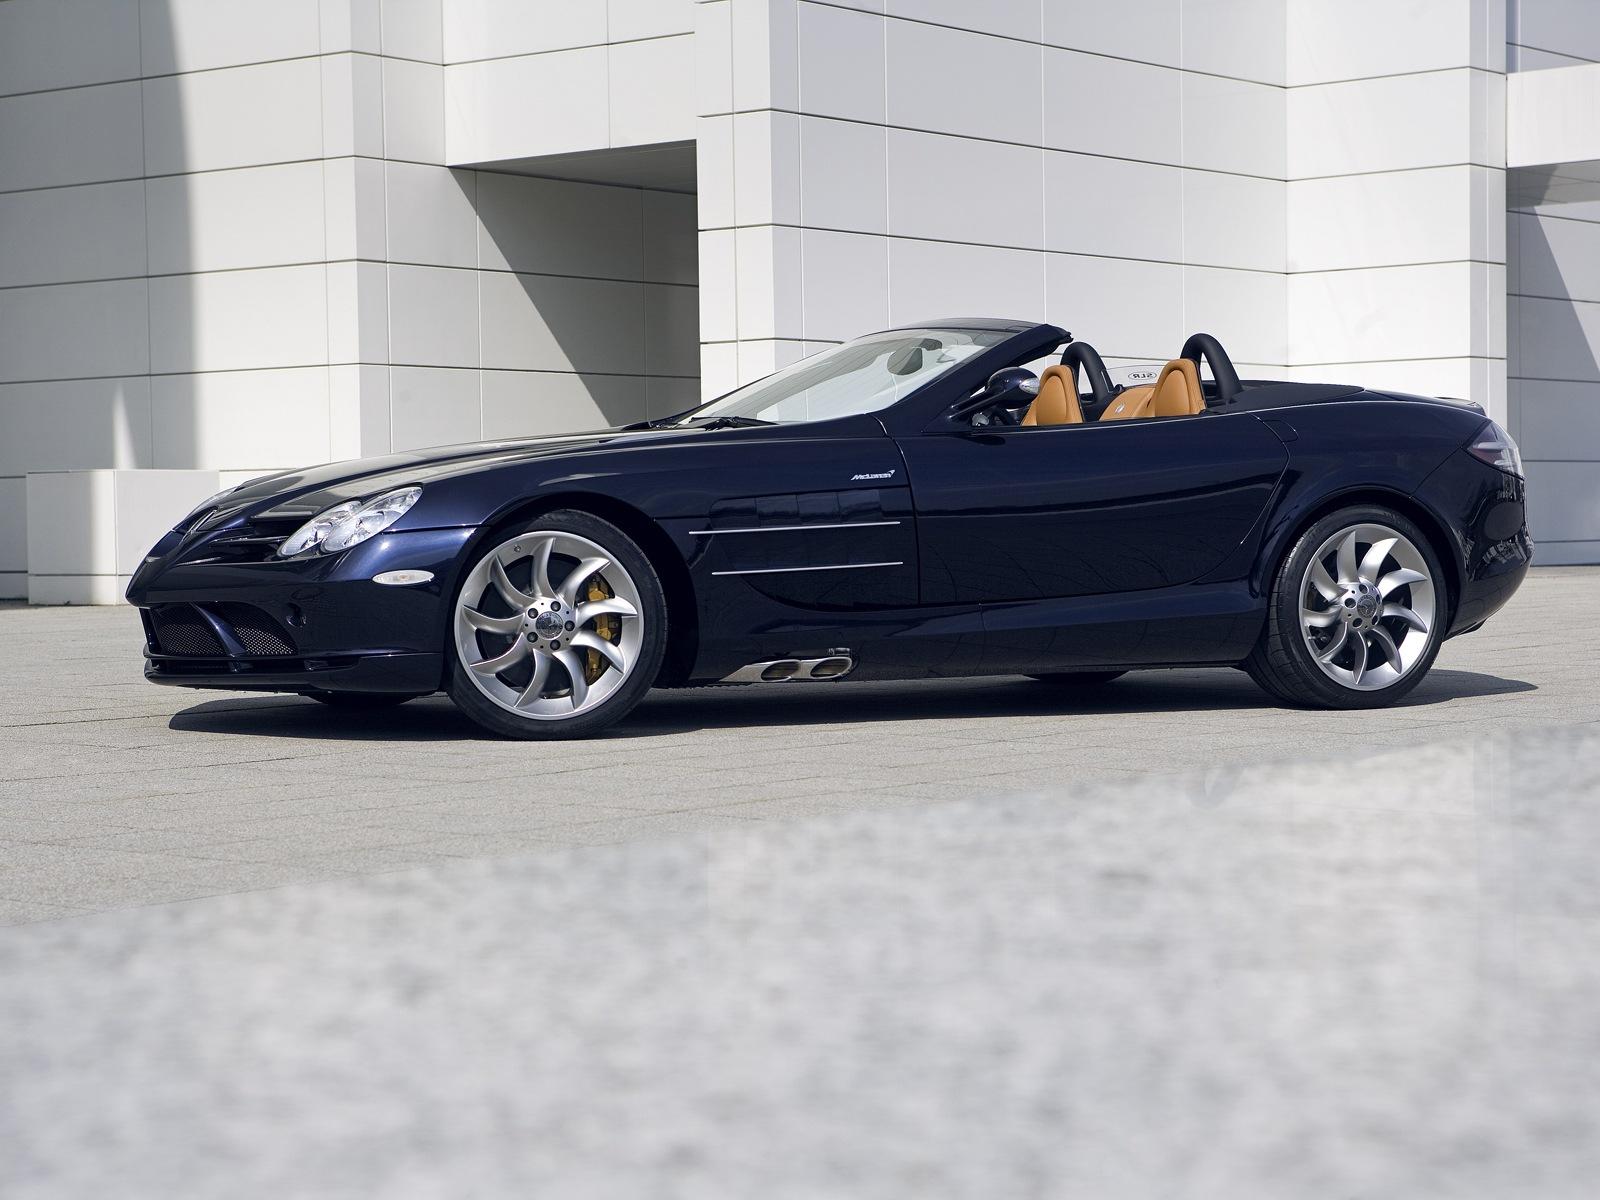 http://3.bp.blogspot.com/-Mnbni-VBUEc/TyGOJ1h7HMI/AAAAAAAAADU/yPkF6GDHzrQ/s1600/Mercedes-McLaren-SLR-Roadster-HD-wallpaper-1600x1200+(3).jpg